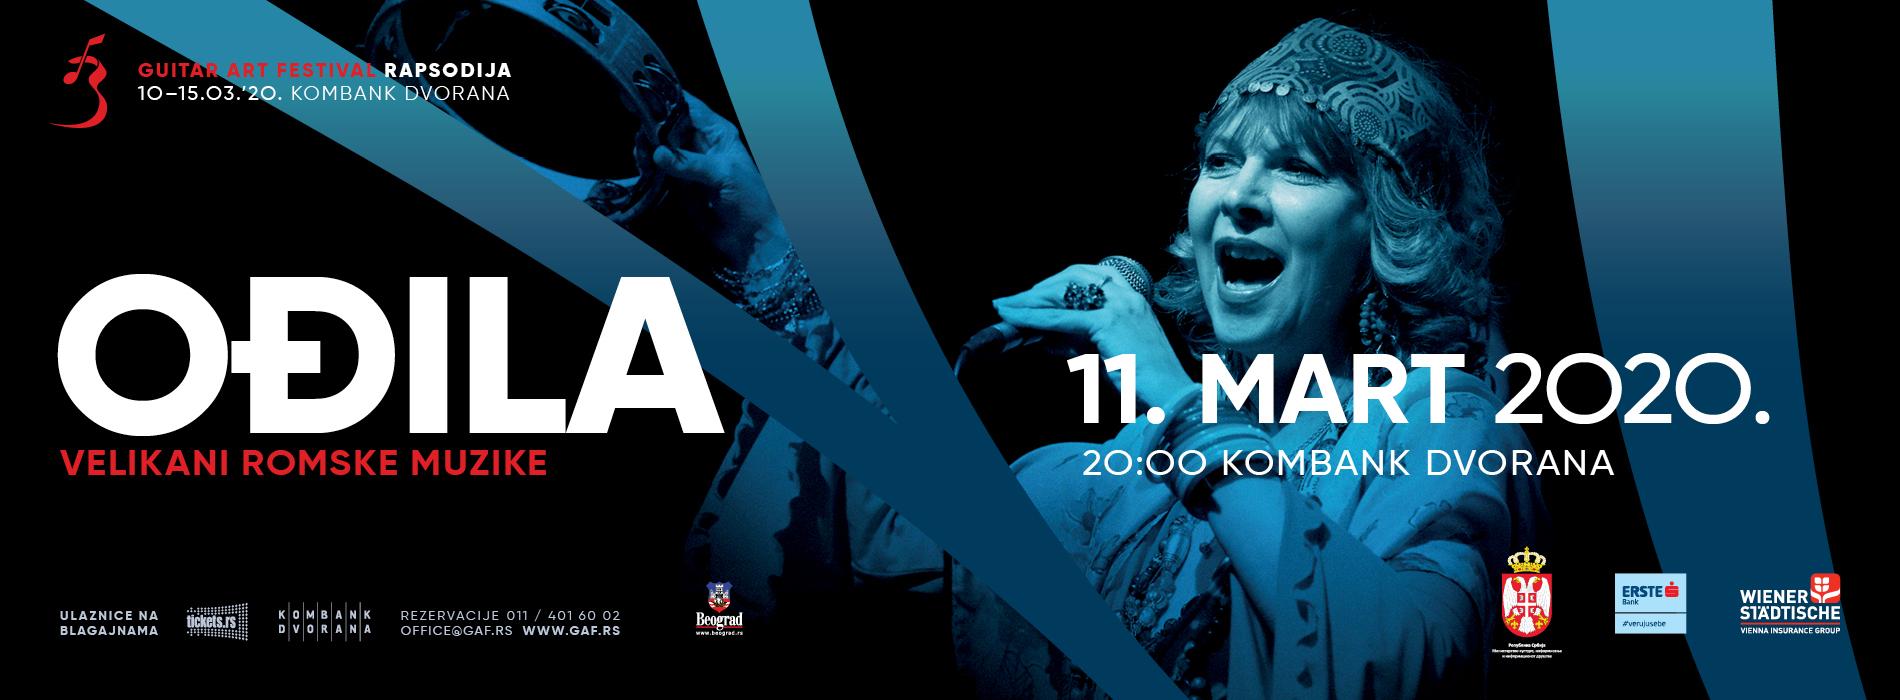 XXI GUITAR ART FESTIVAL – OĐILA 11.03.2020. Kombank dvorana